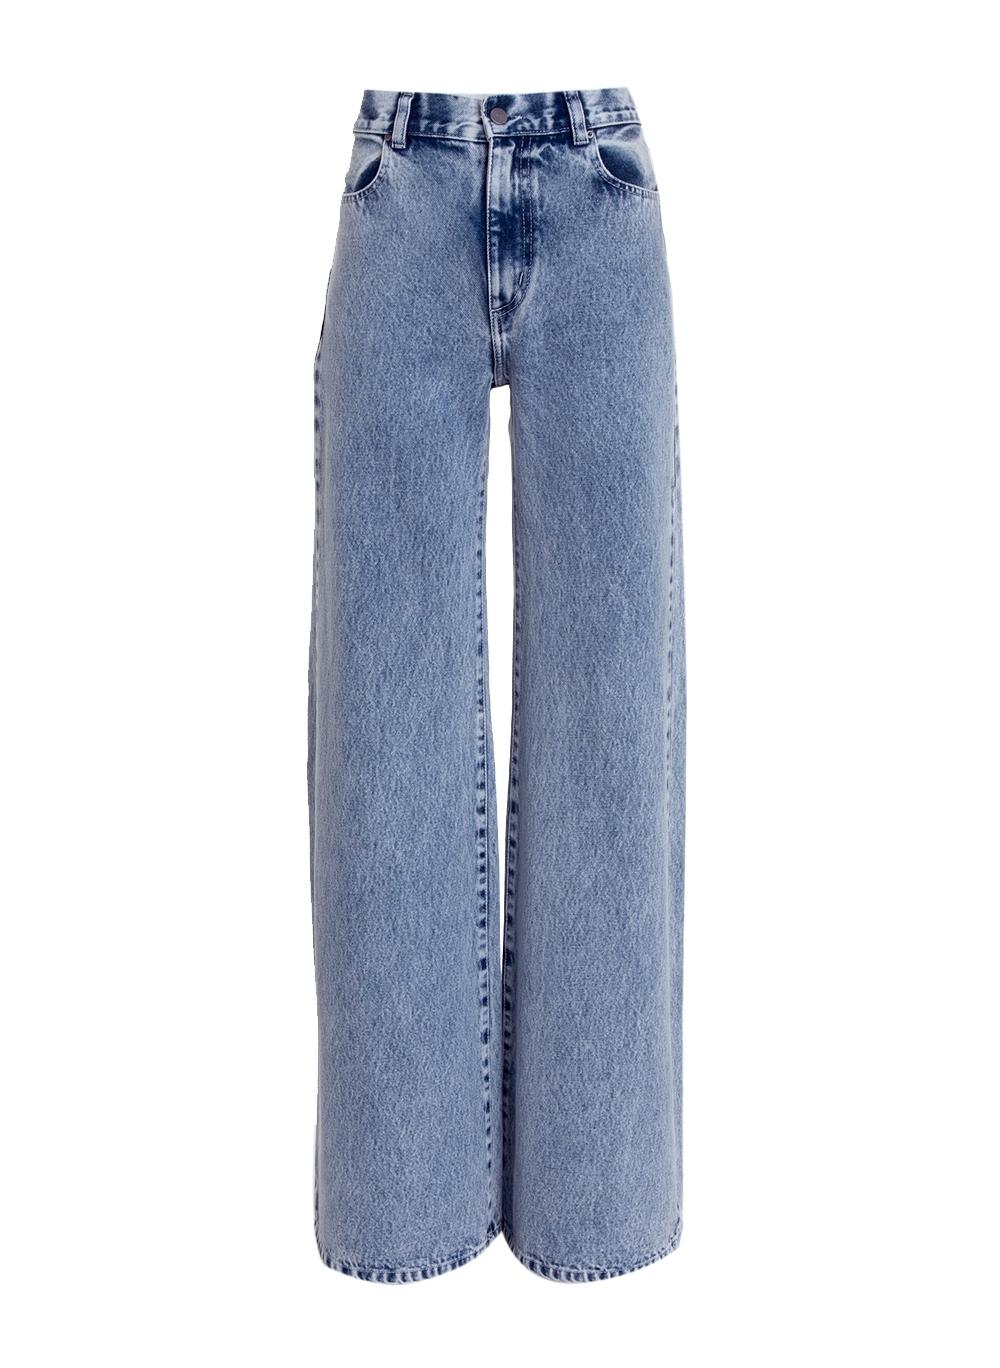 Calça Rosa Chá Marte Ii Feminina (Jeans Claro, 34)